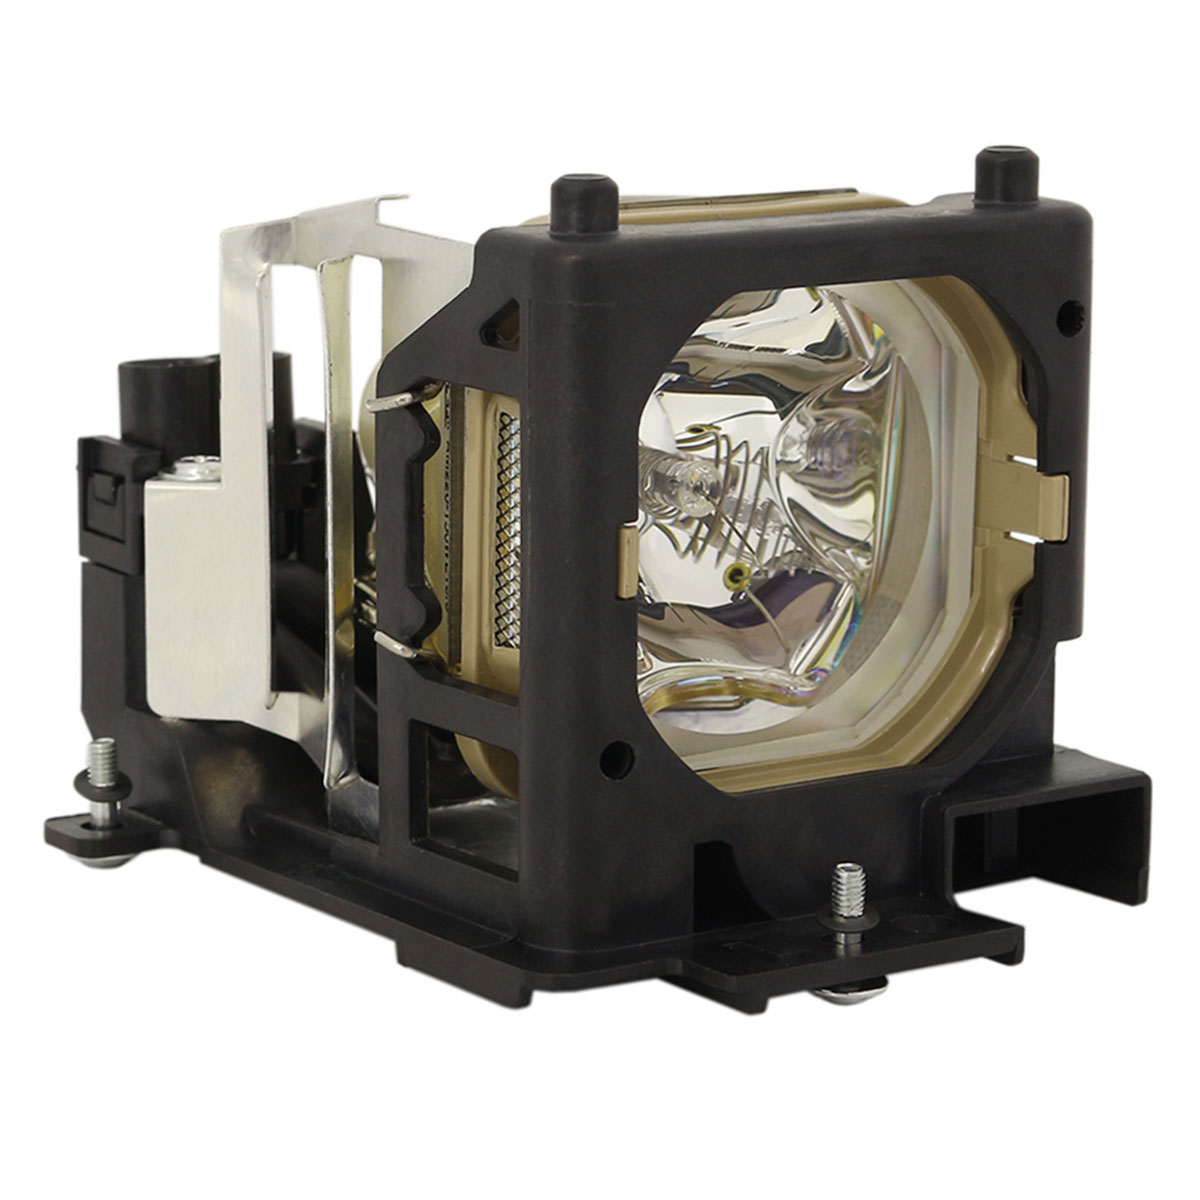 Lutema Platinum for Viewsonic PJ562 Projector Lamp with Housing (Original Philips Bulb Inside) - image 2 de 5